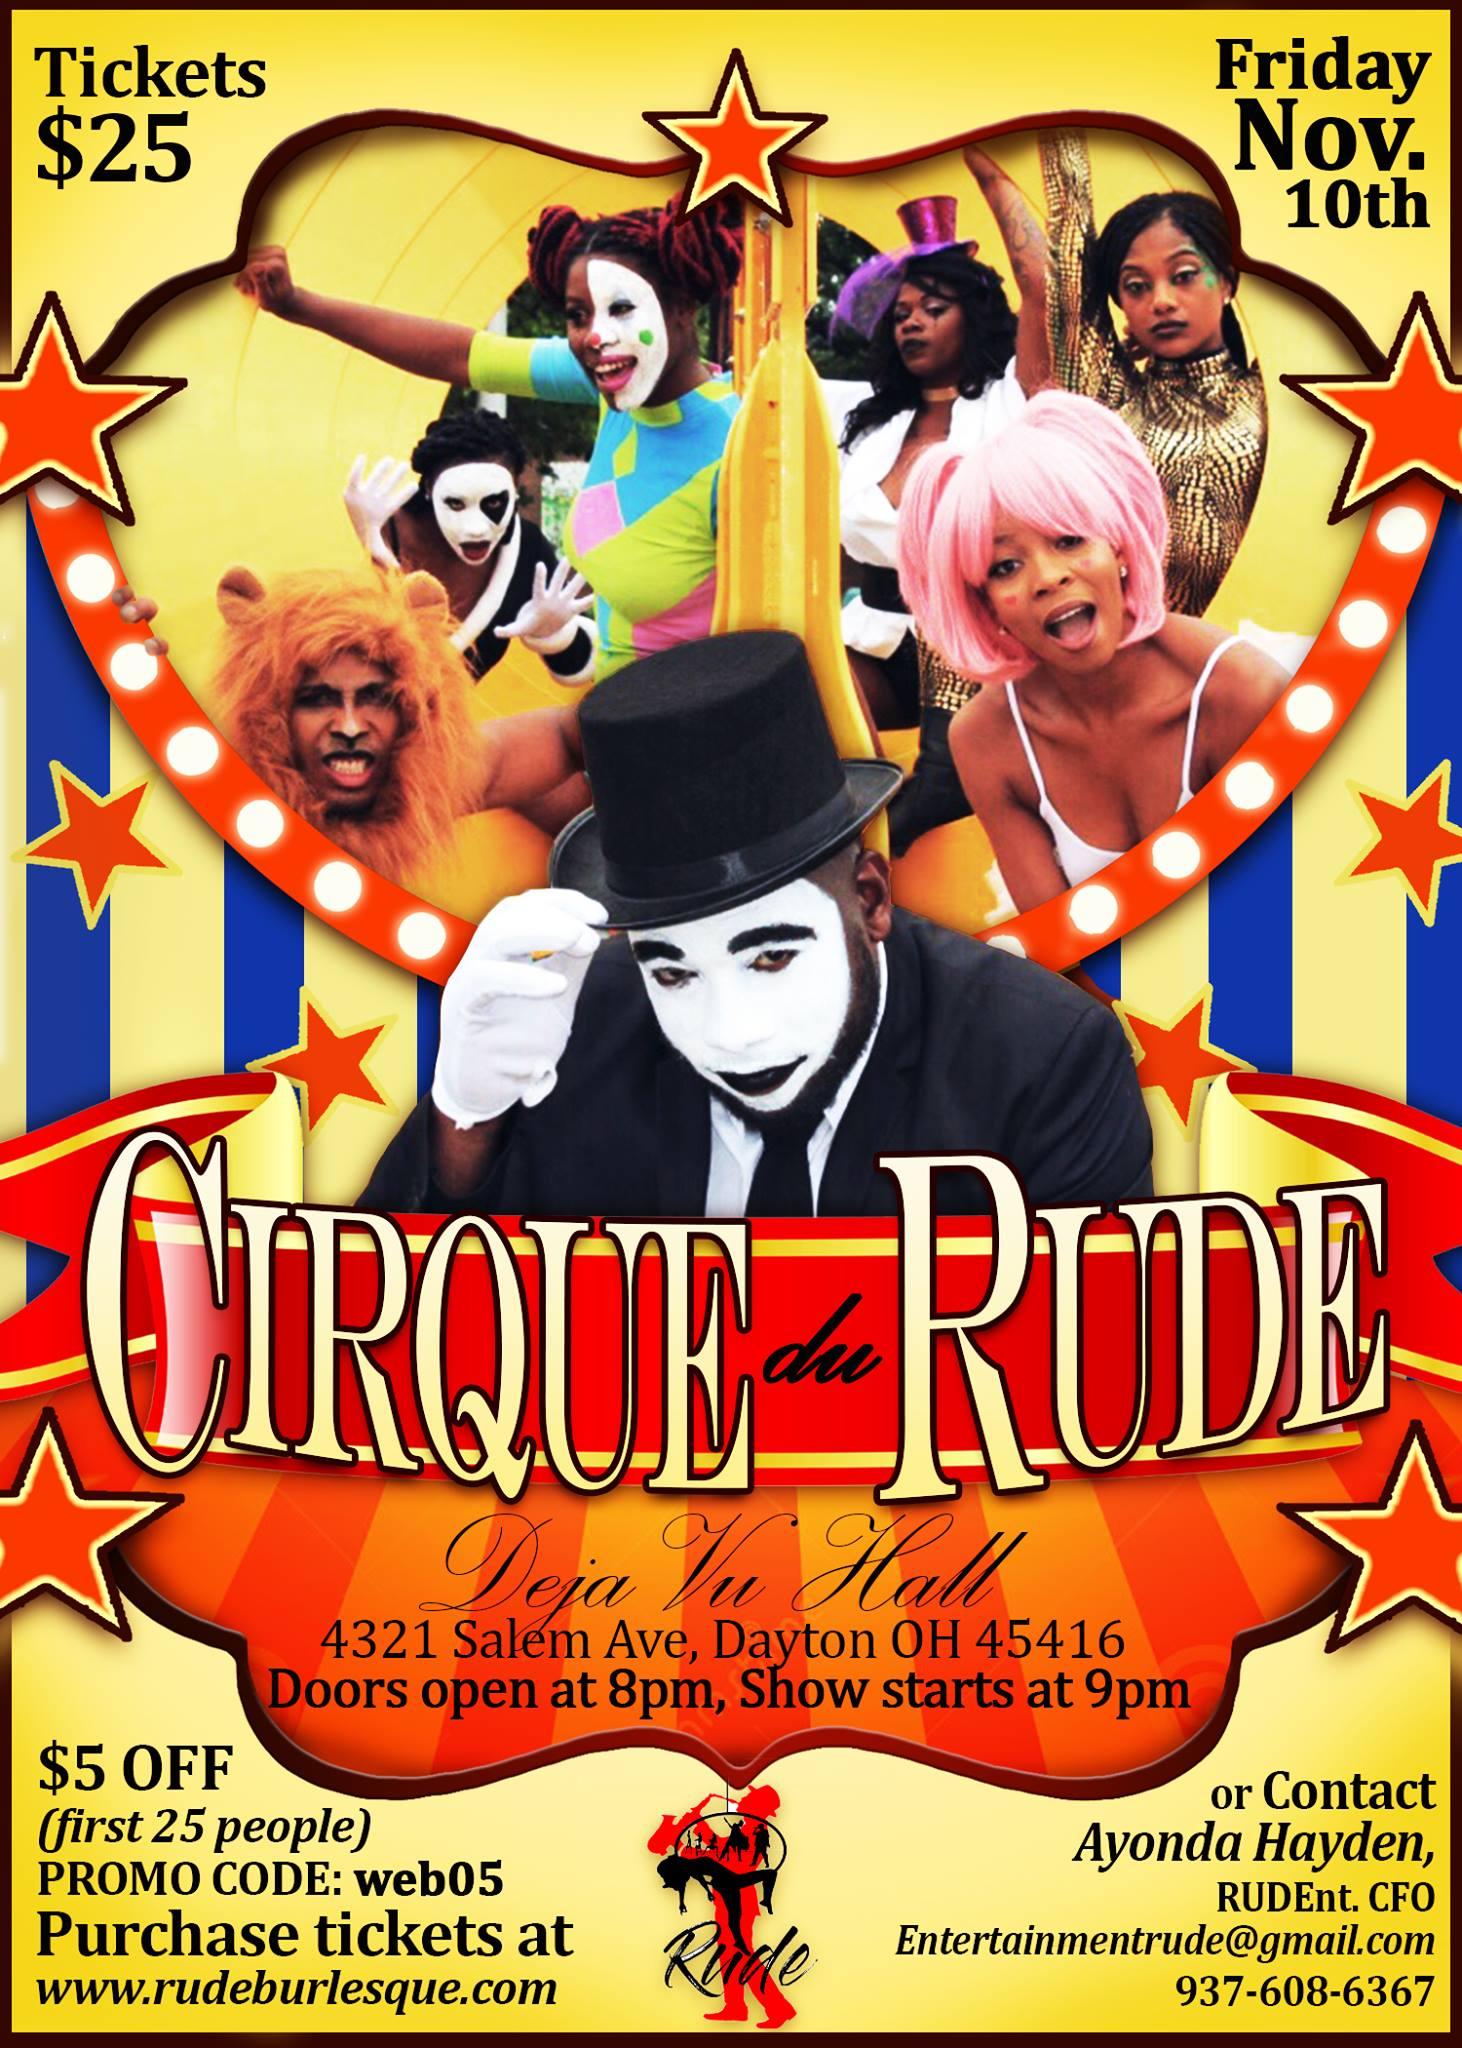 Cirque du RUDE